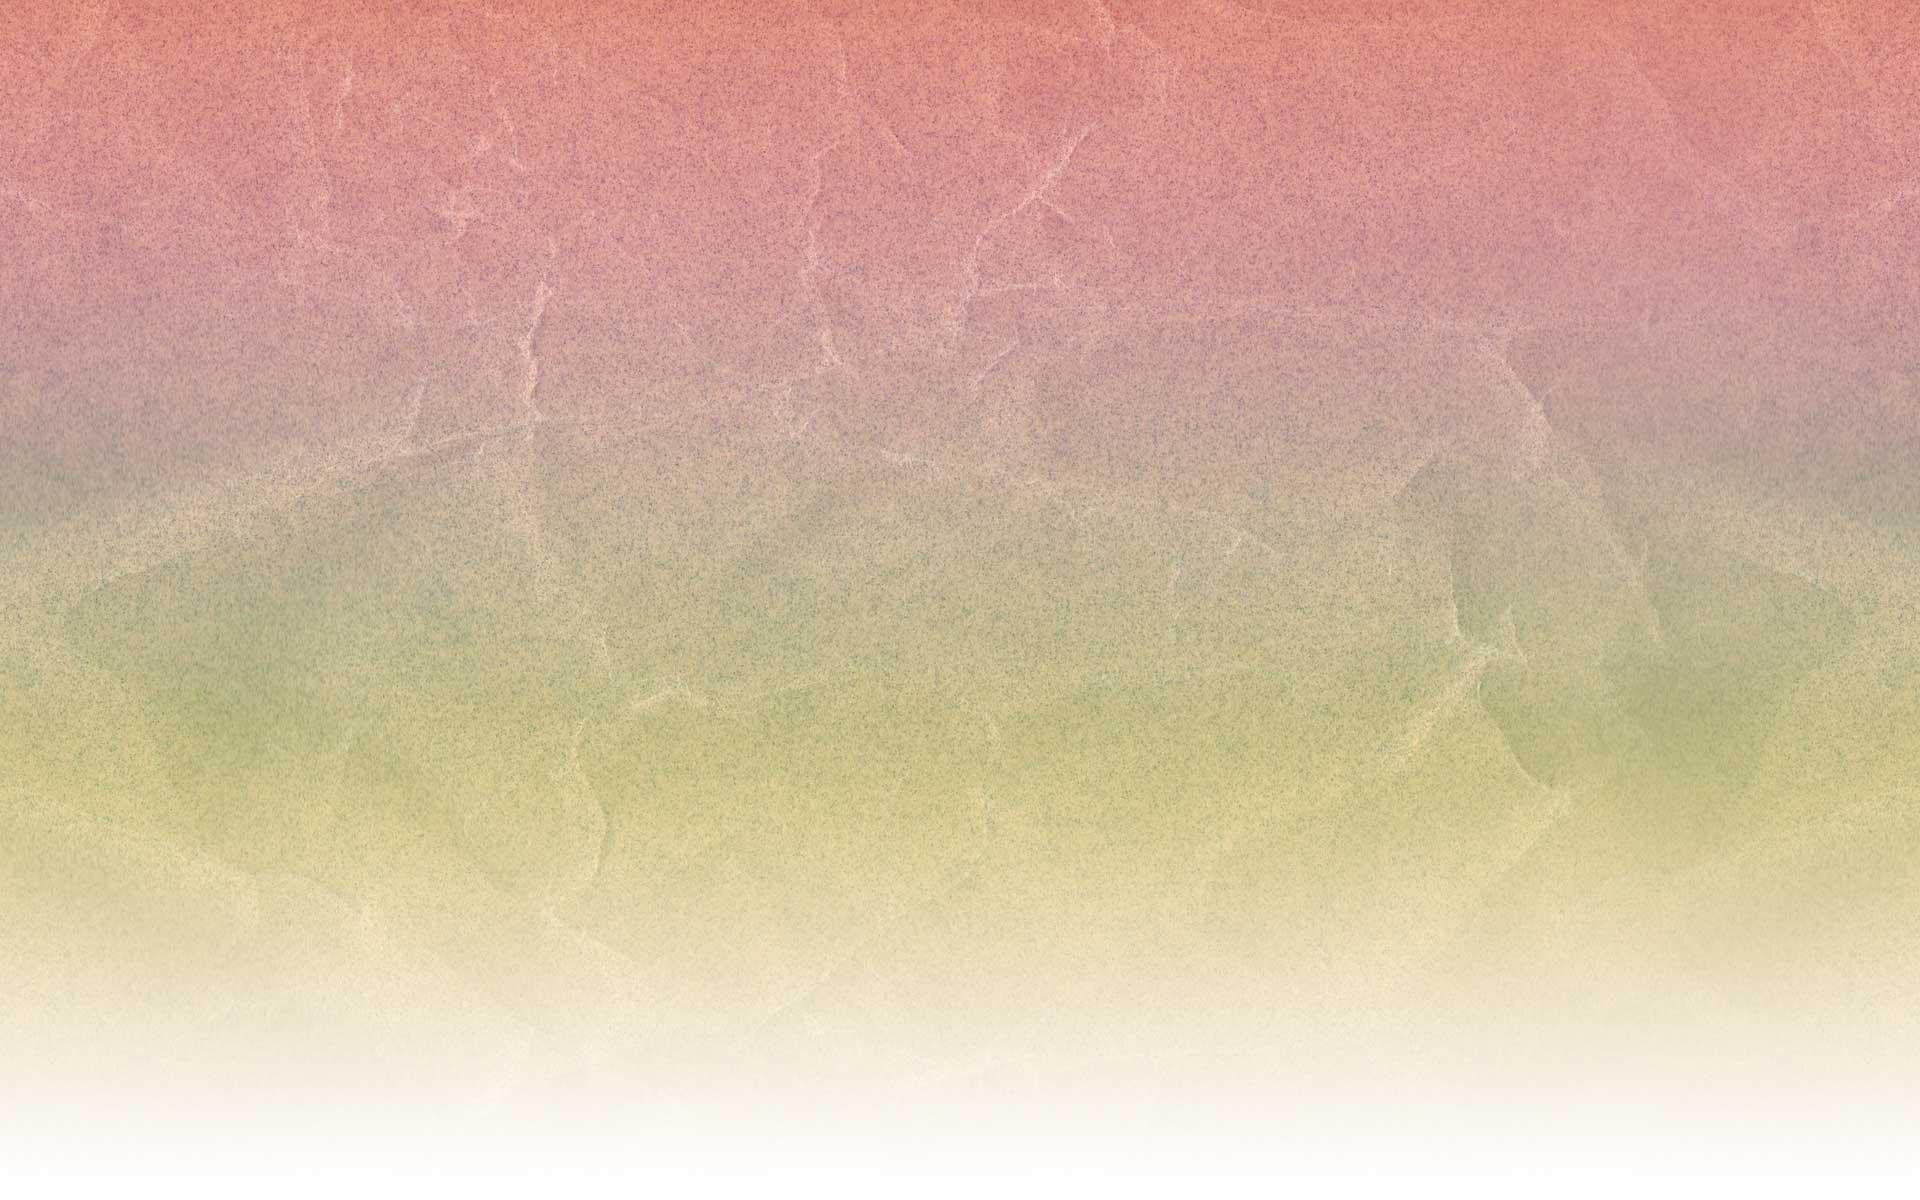 Huge Repeating Website Background Part 1 Oakes Design Web Design 1920x1200